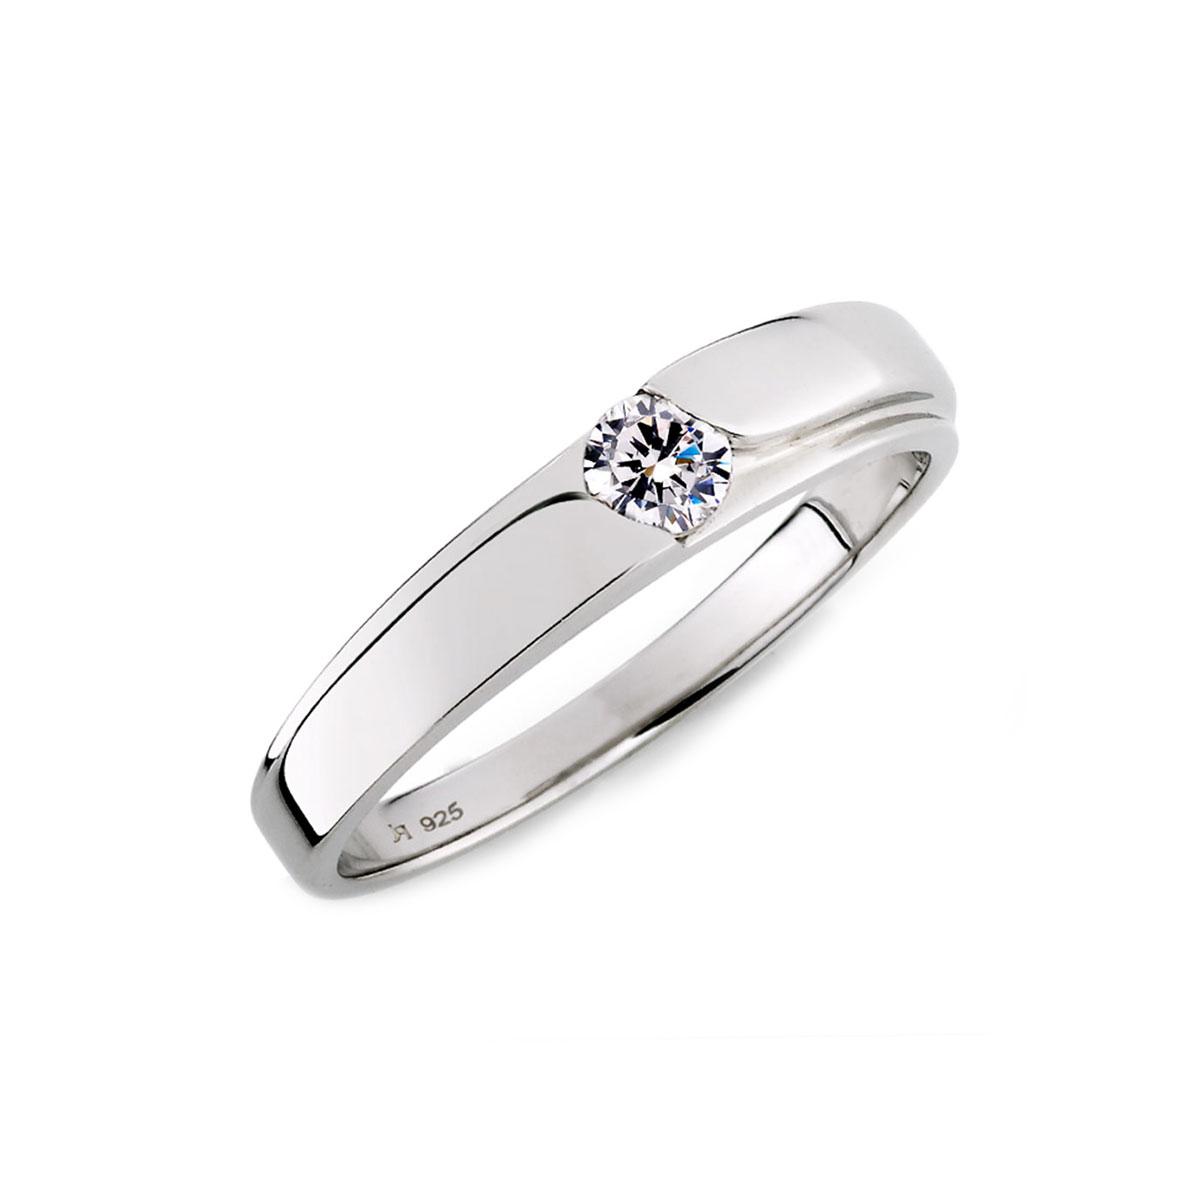 KSW252 因你而在單鑽戒指